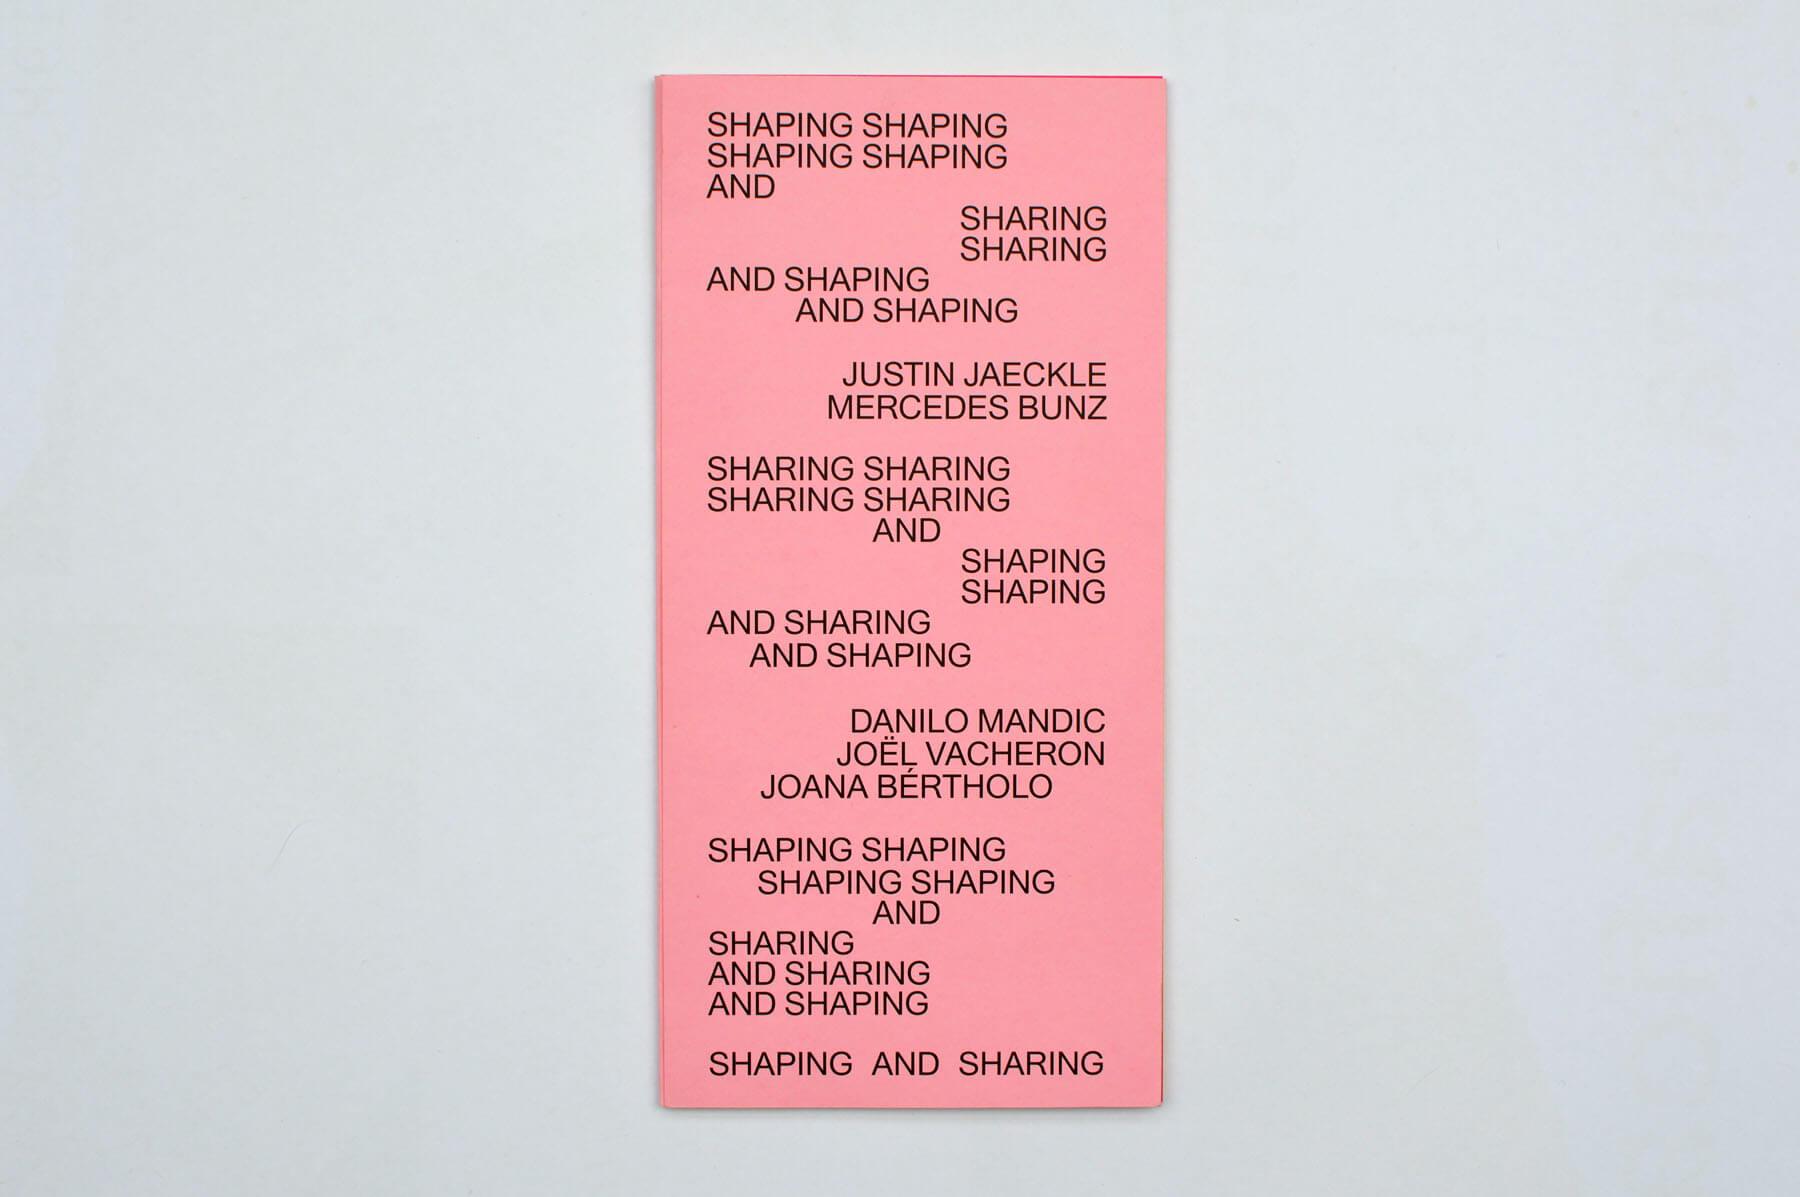 shaping and sharing isabel lucena 01